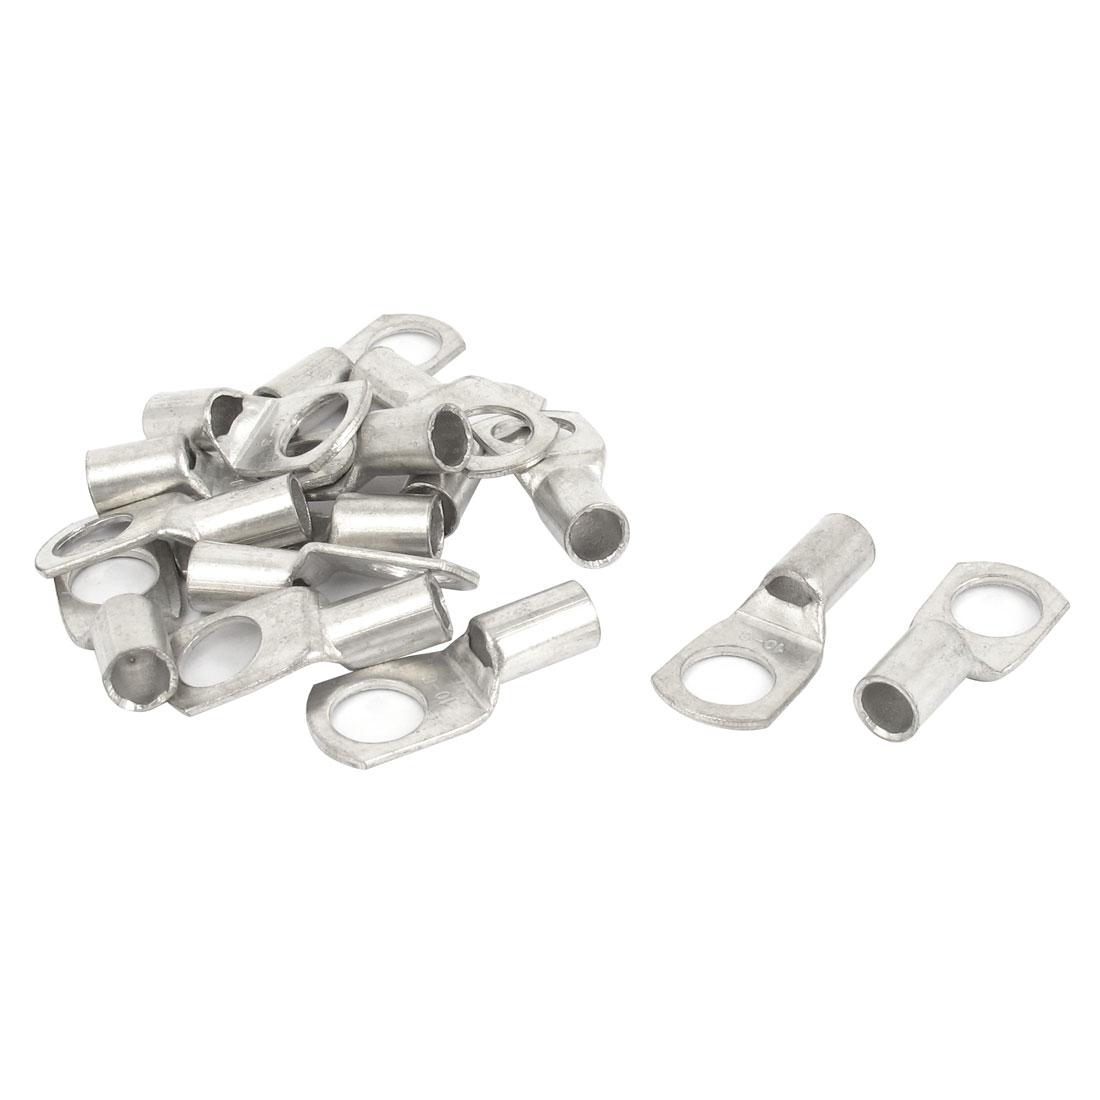 15 Pcs Silver Tone 10-8 8mm Bolt 10mm2 Copper Cable Lug Terminal